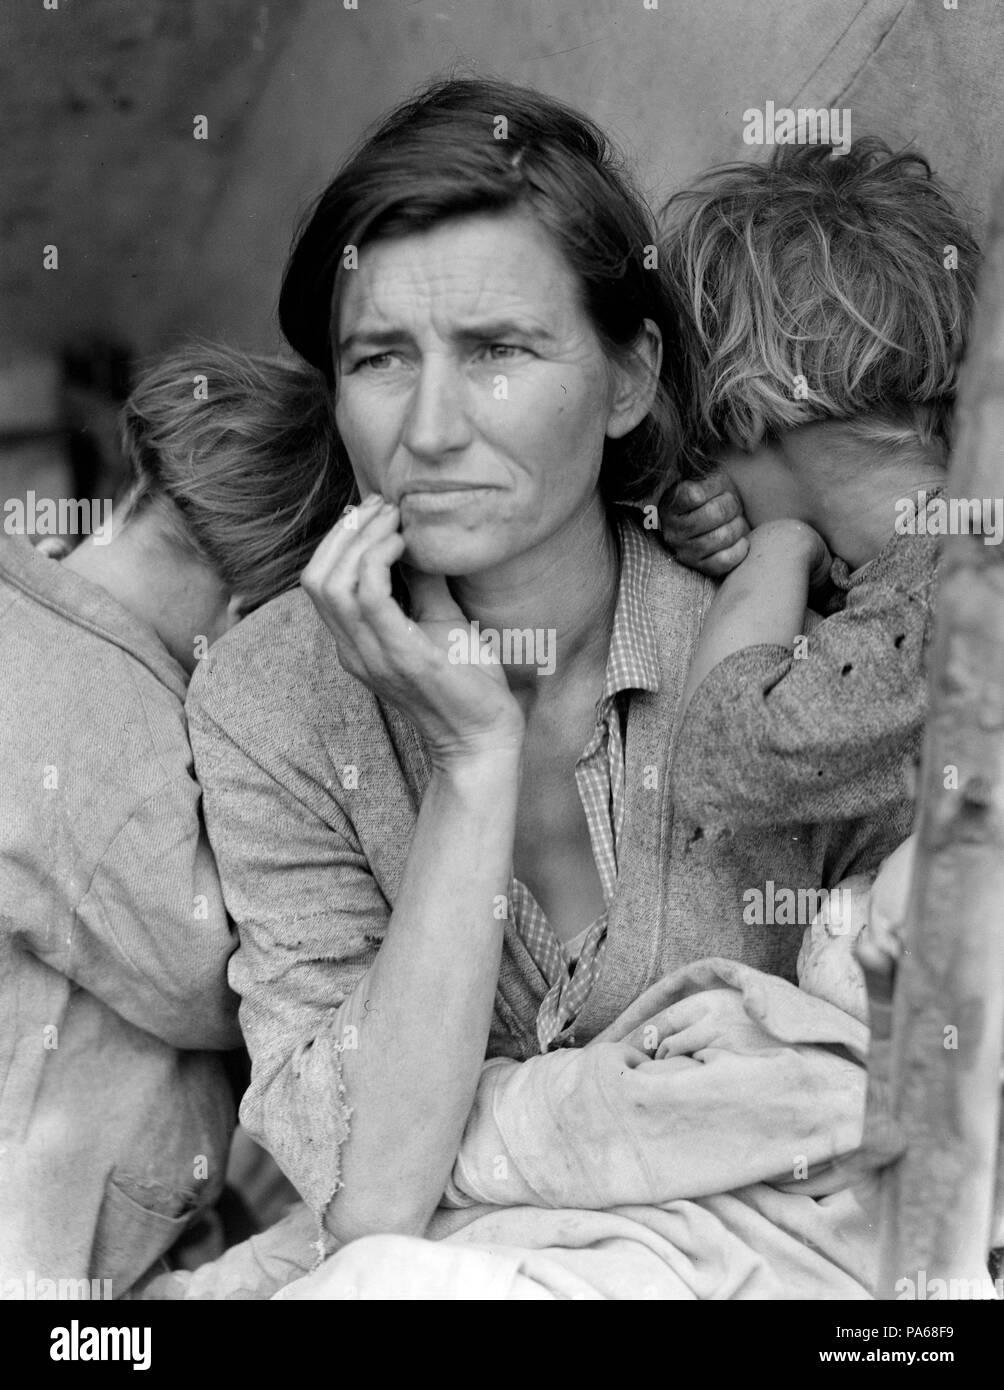 Dorothea Lange / 'Migrant Mother', Nipomo, 1936. - Stock Image